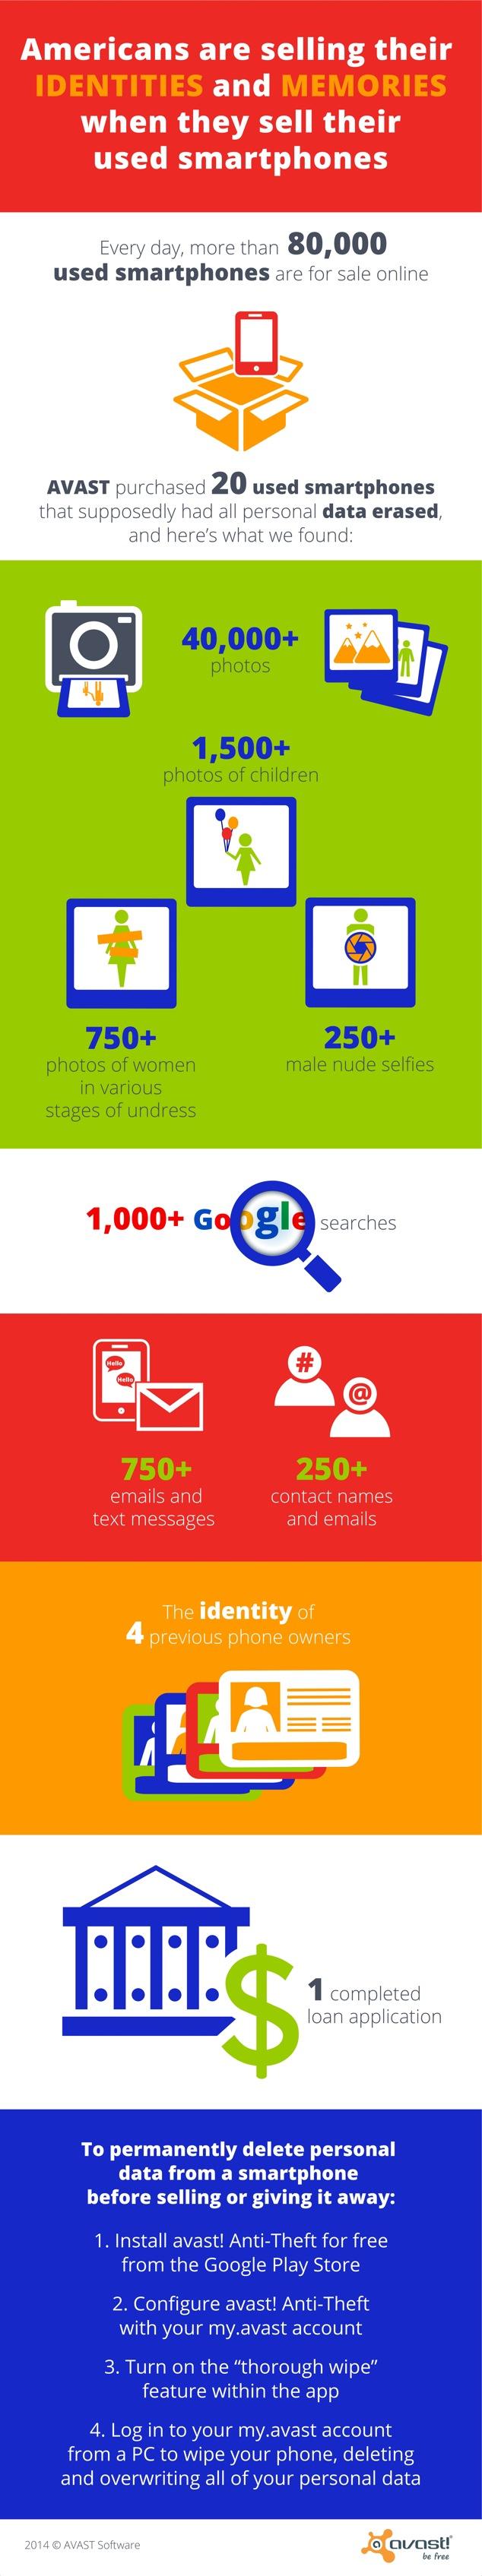 AVAST-Used-Smartphone-Infographic